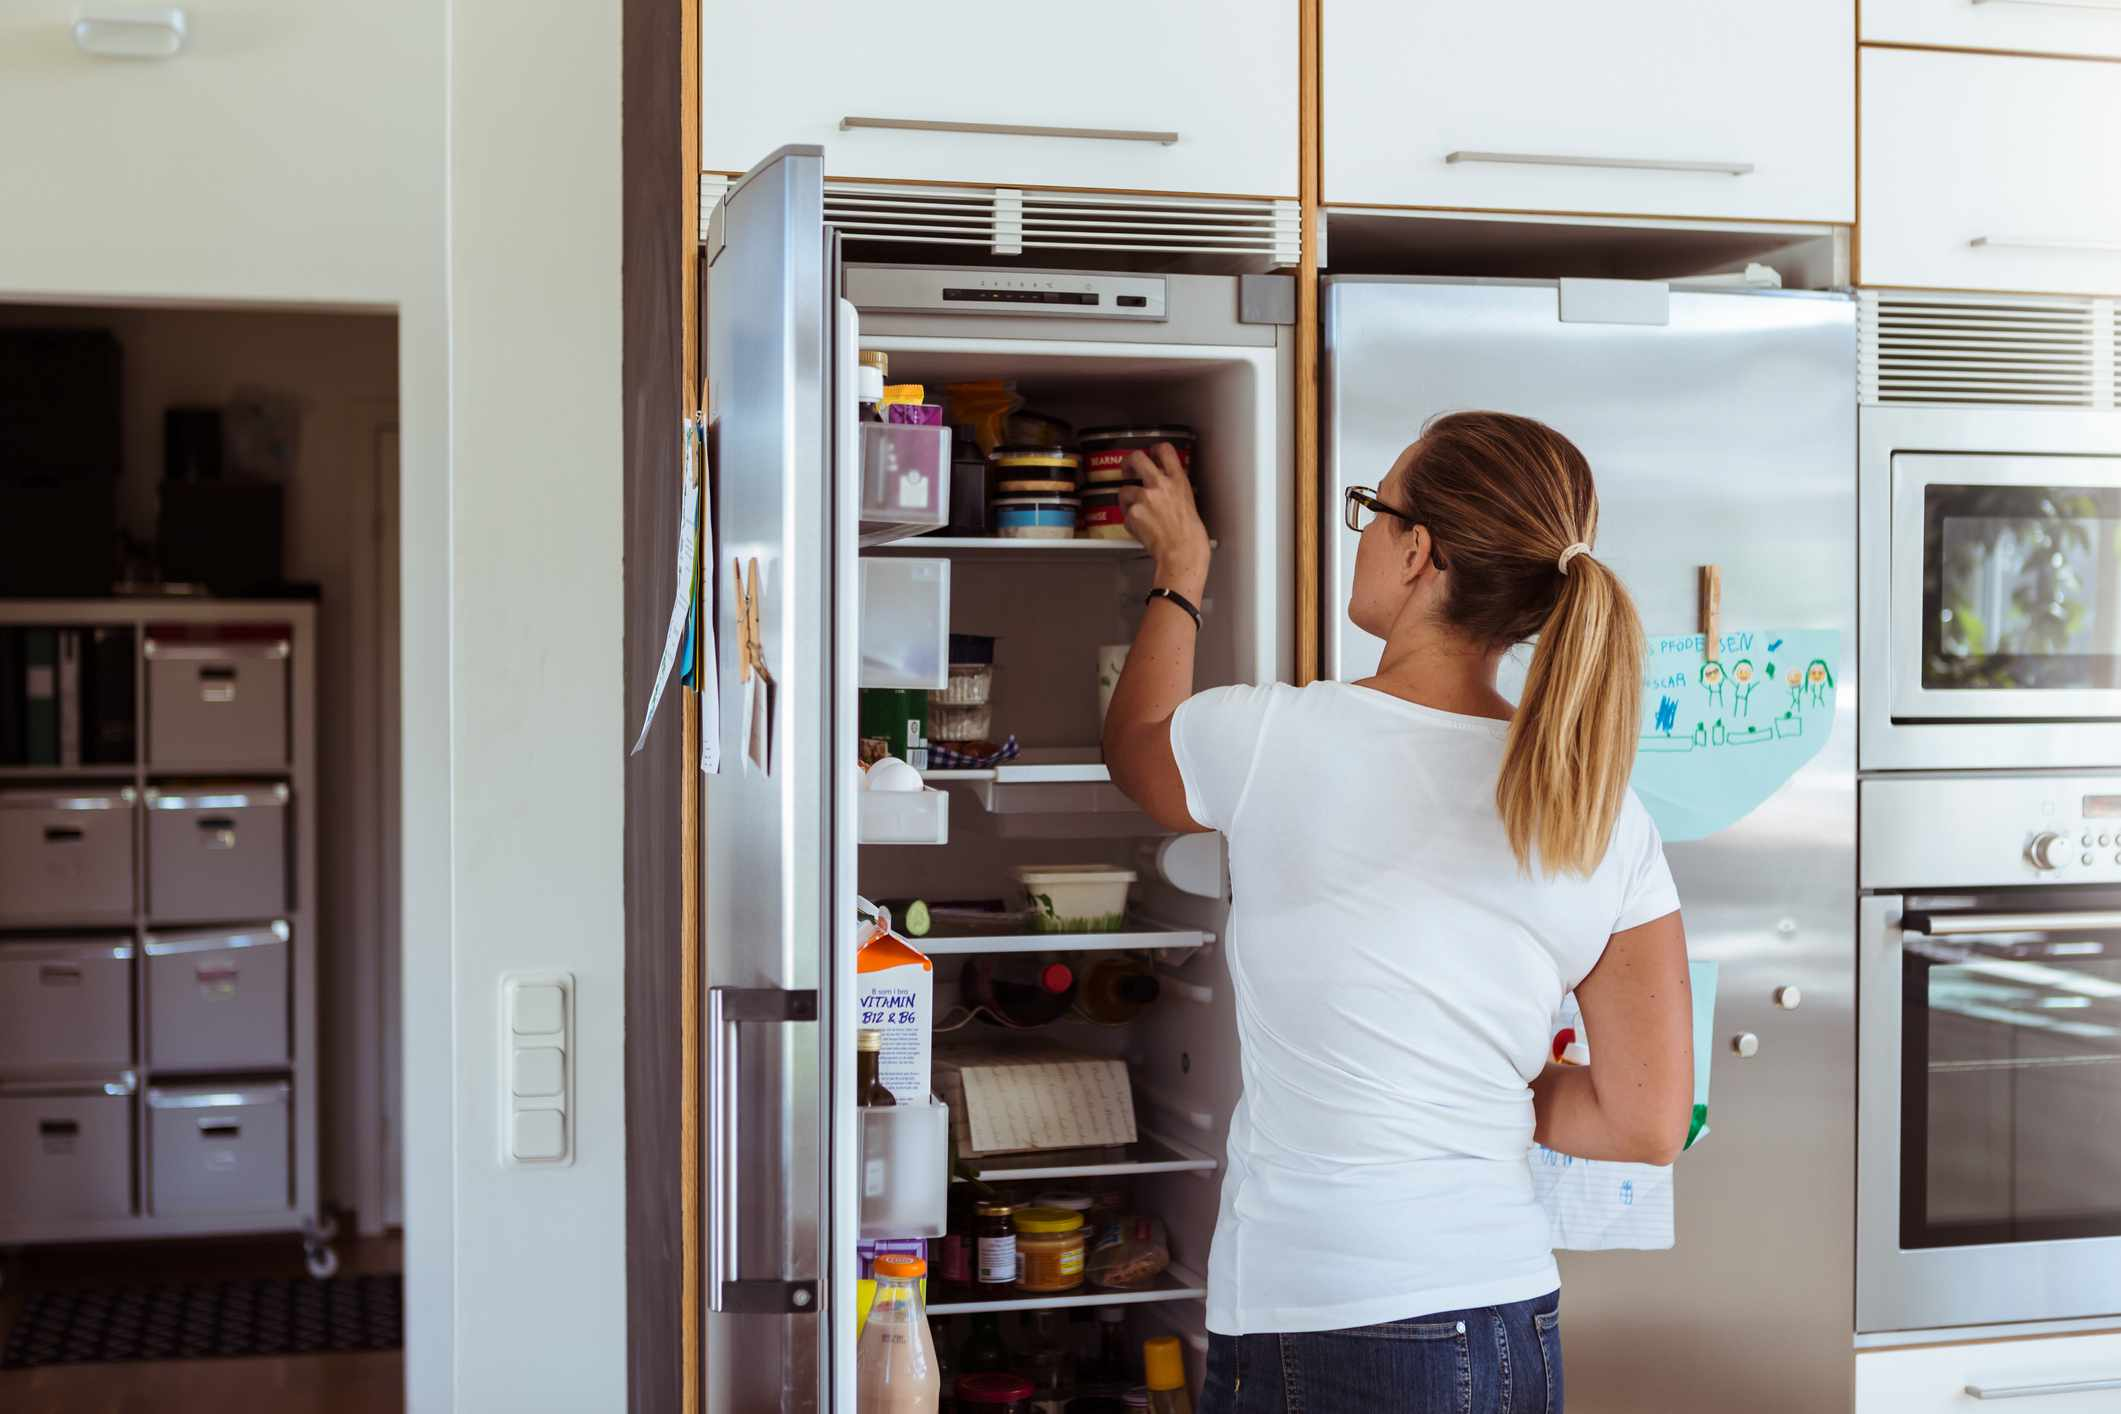 A woman organizing her refrigerator.